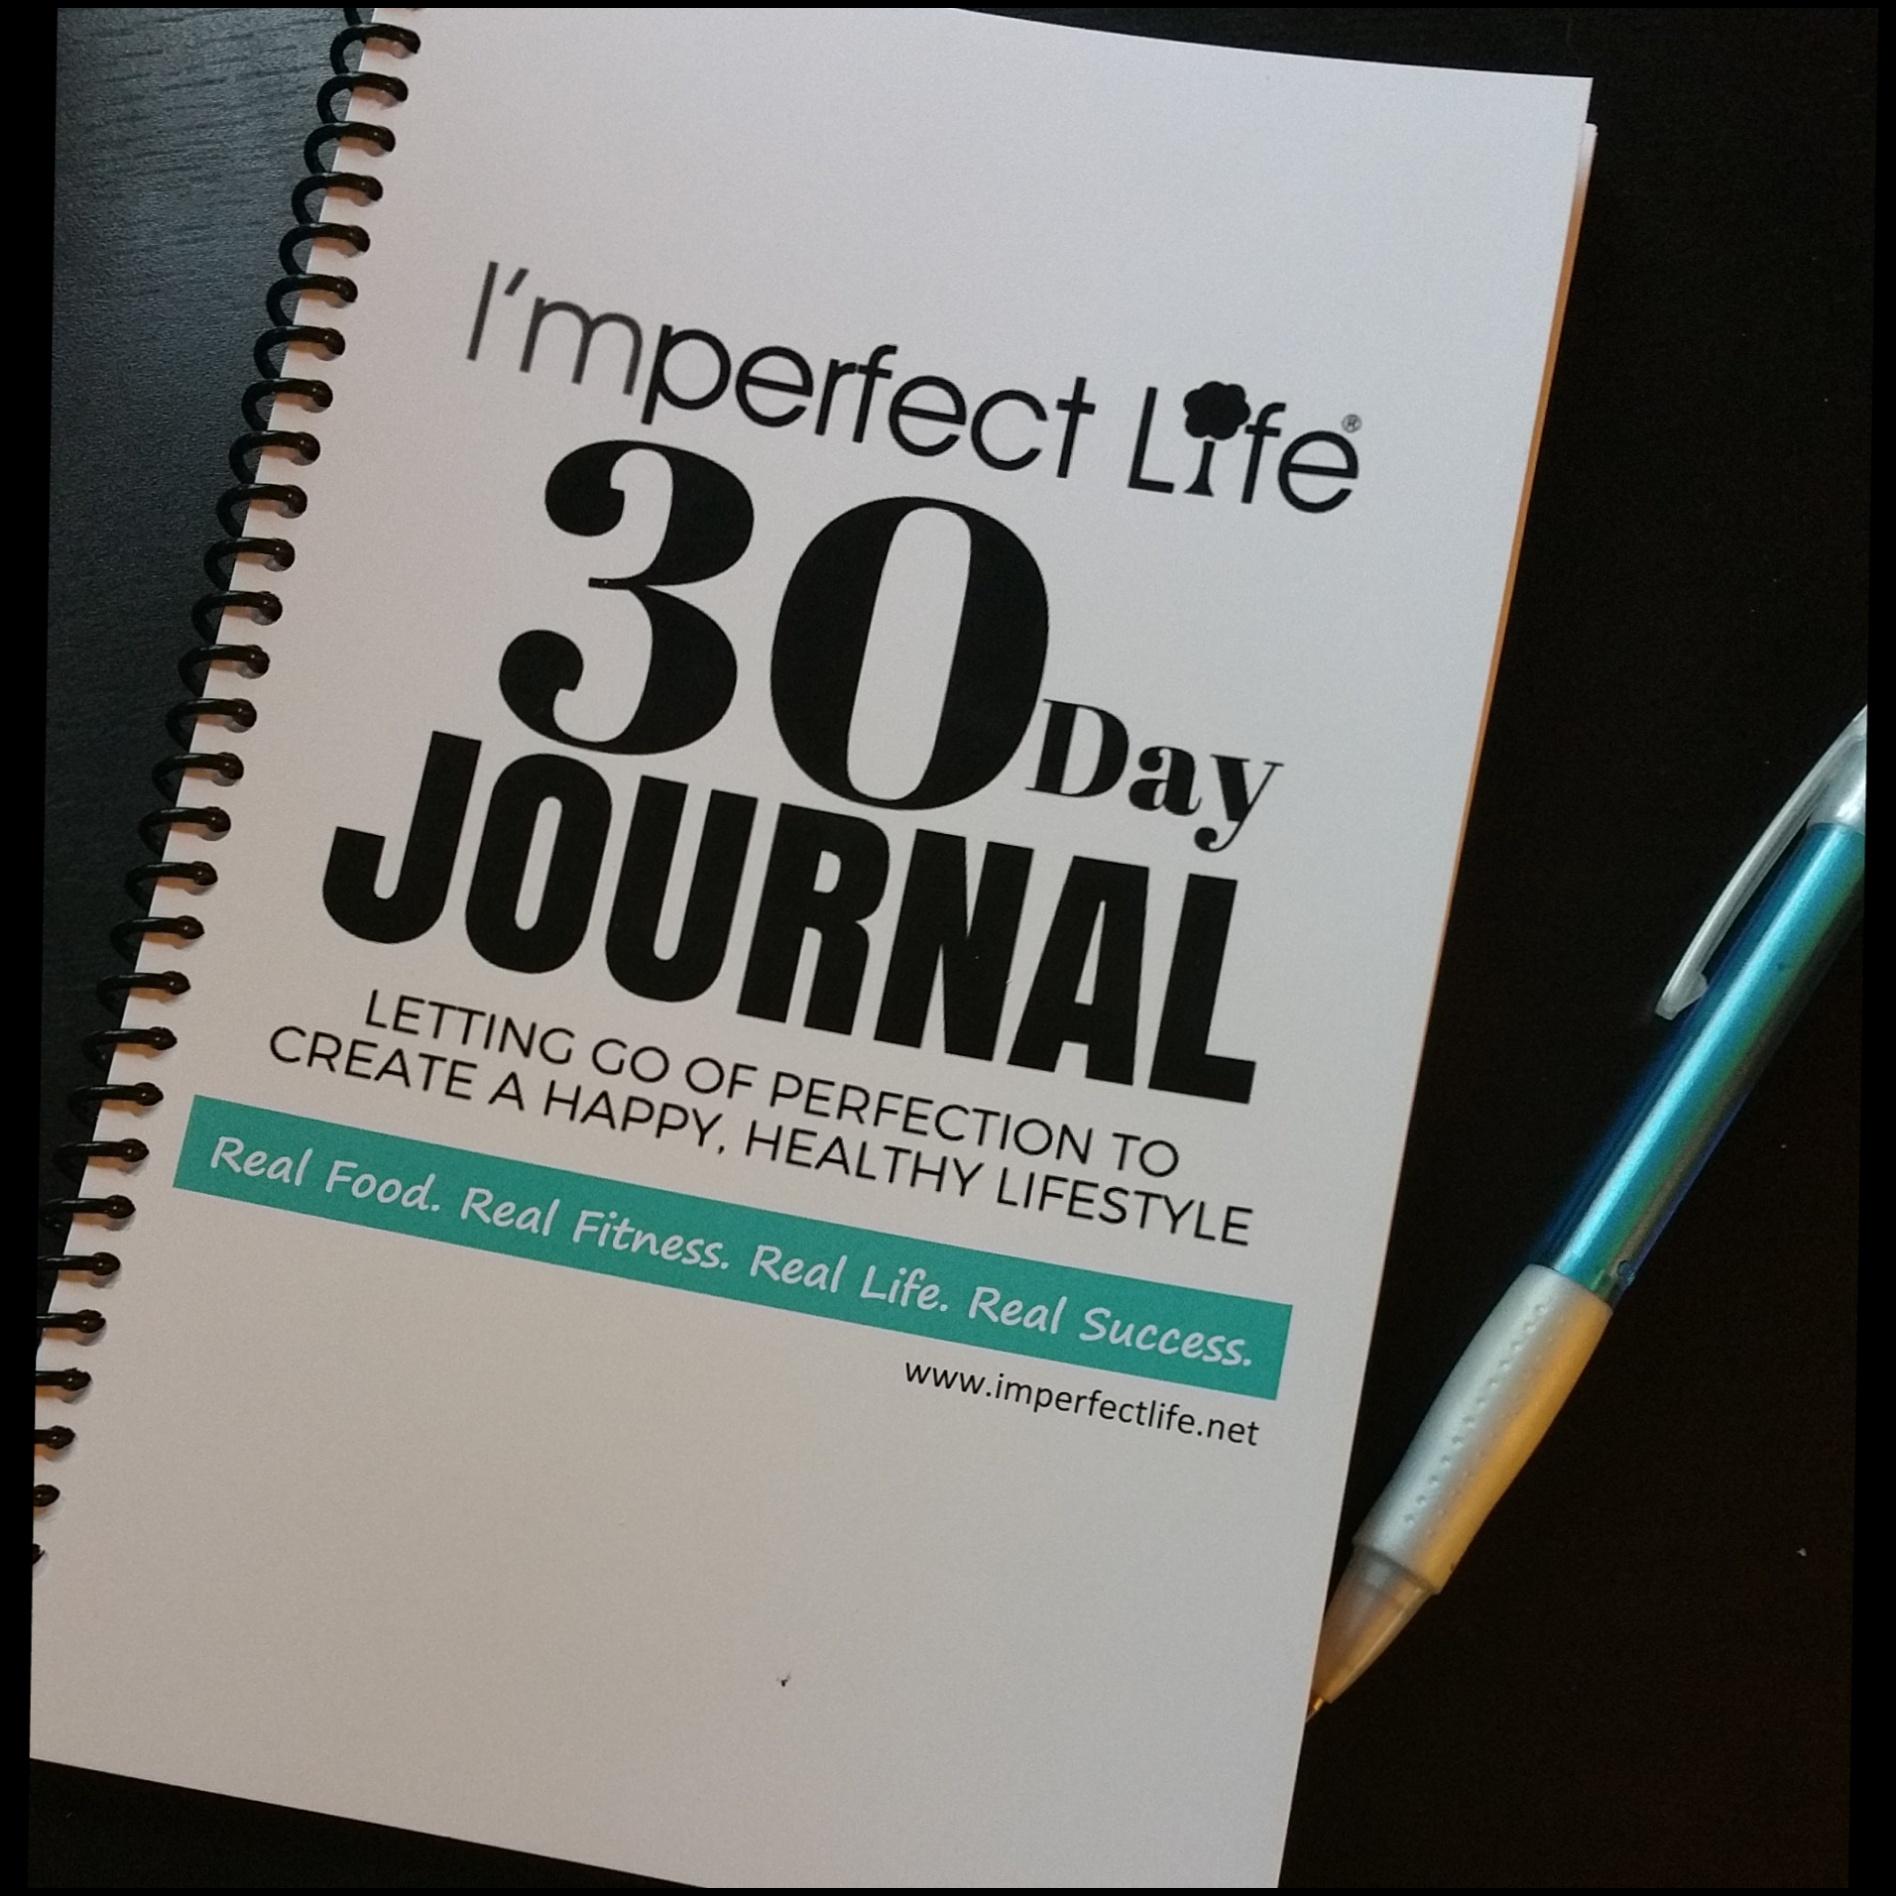 IPL 30 Day Journal